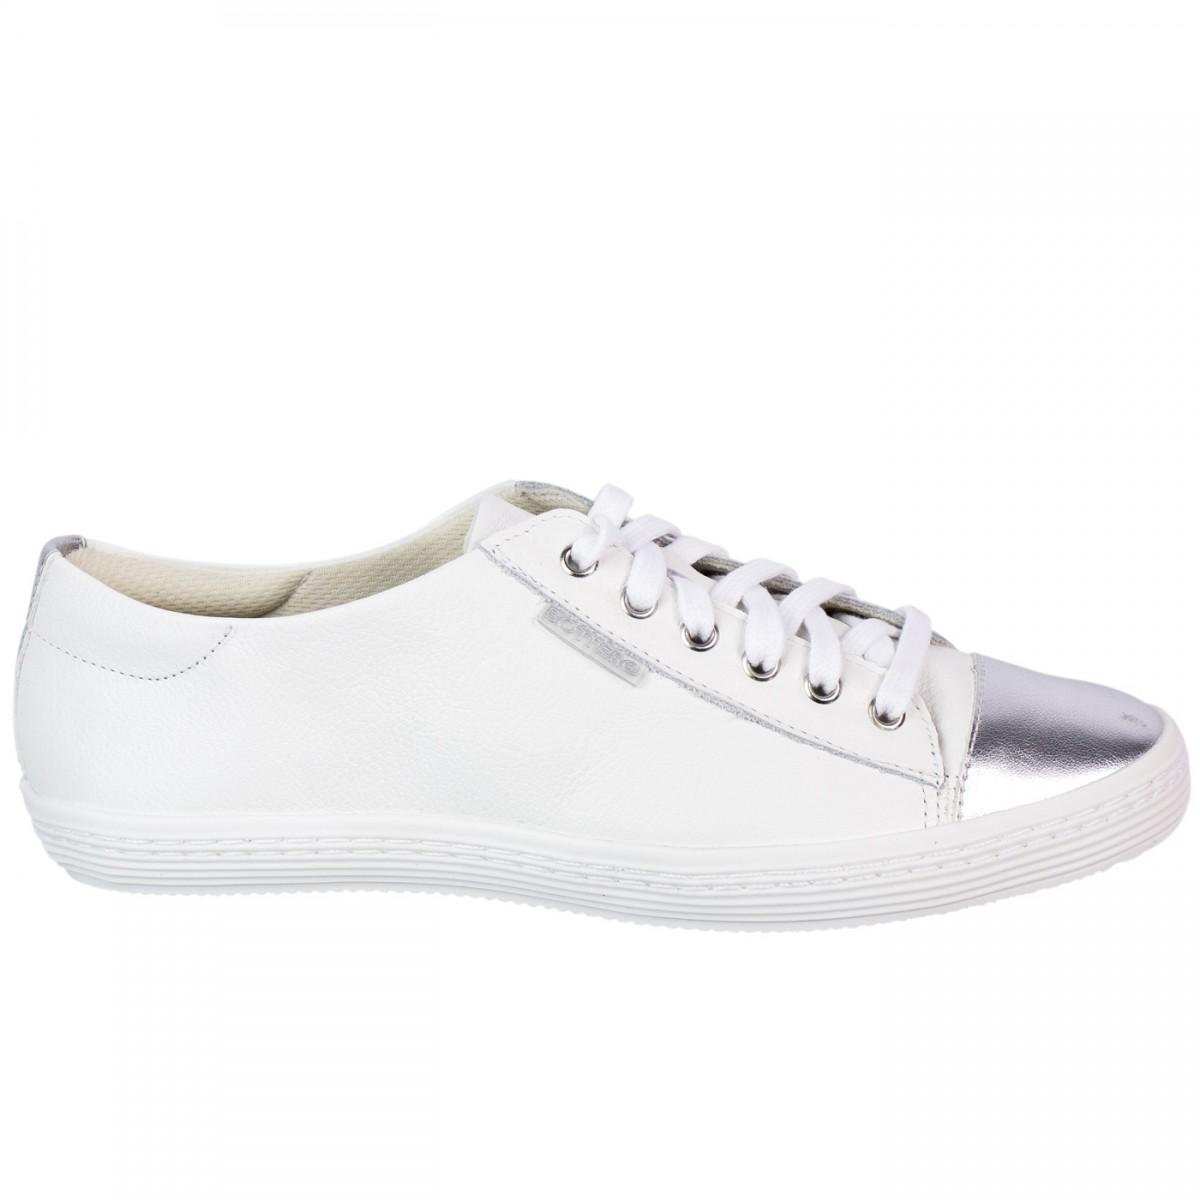 c28b823fa02 Bizz Store - Tênis Feminino Bottero Couro Floater Branco Jeans